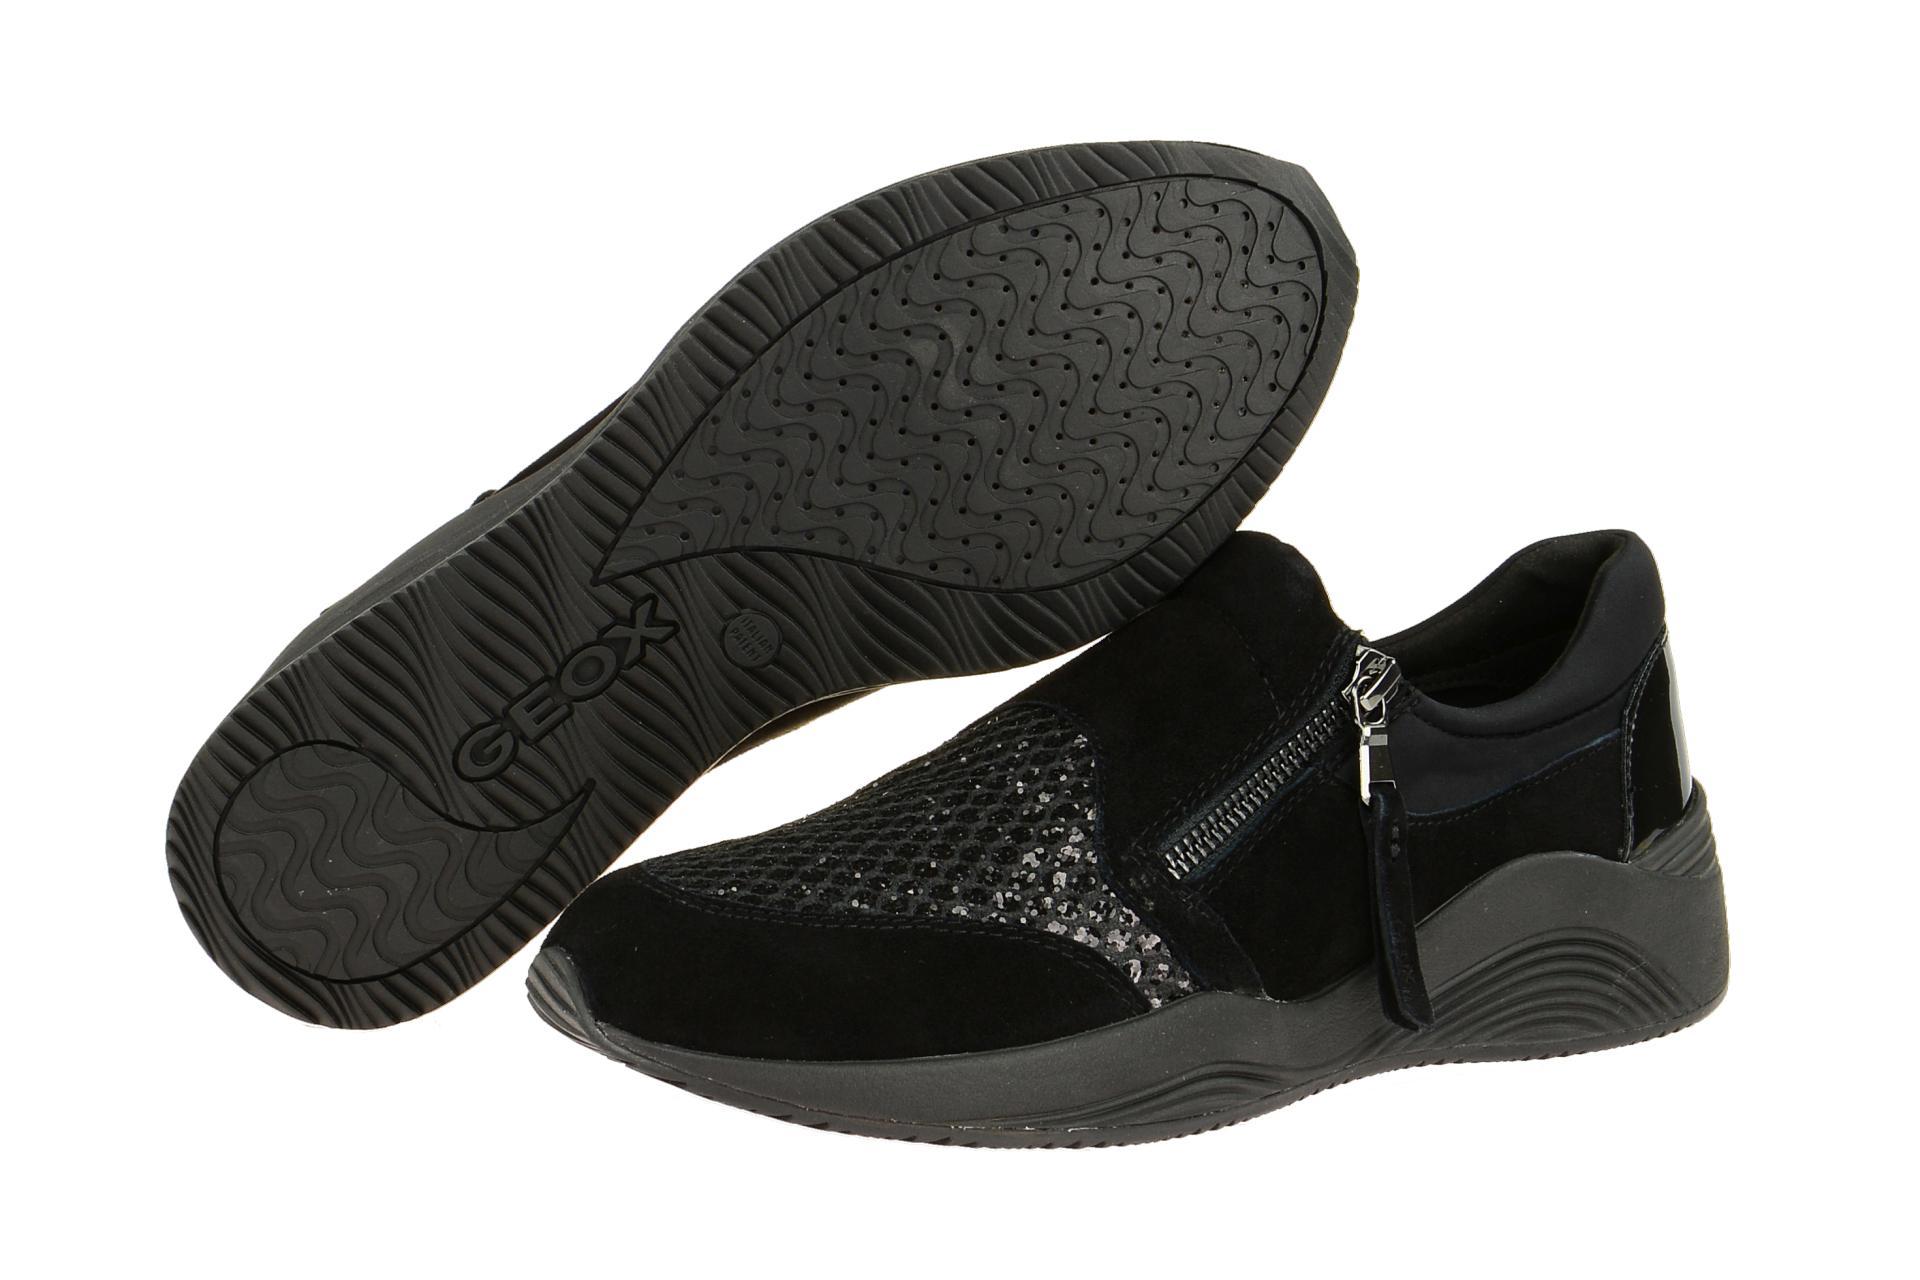 Geox Schuhe OMAYA schwarz Damenschuhe sportliche Slipper D620SA 021EW C9999